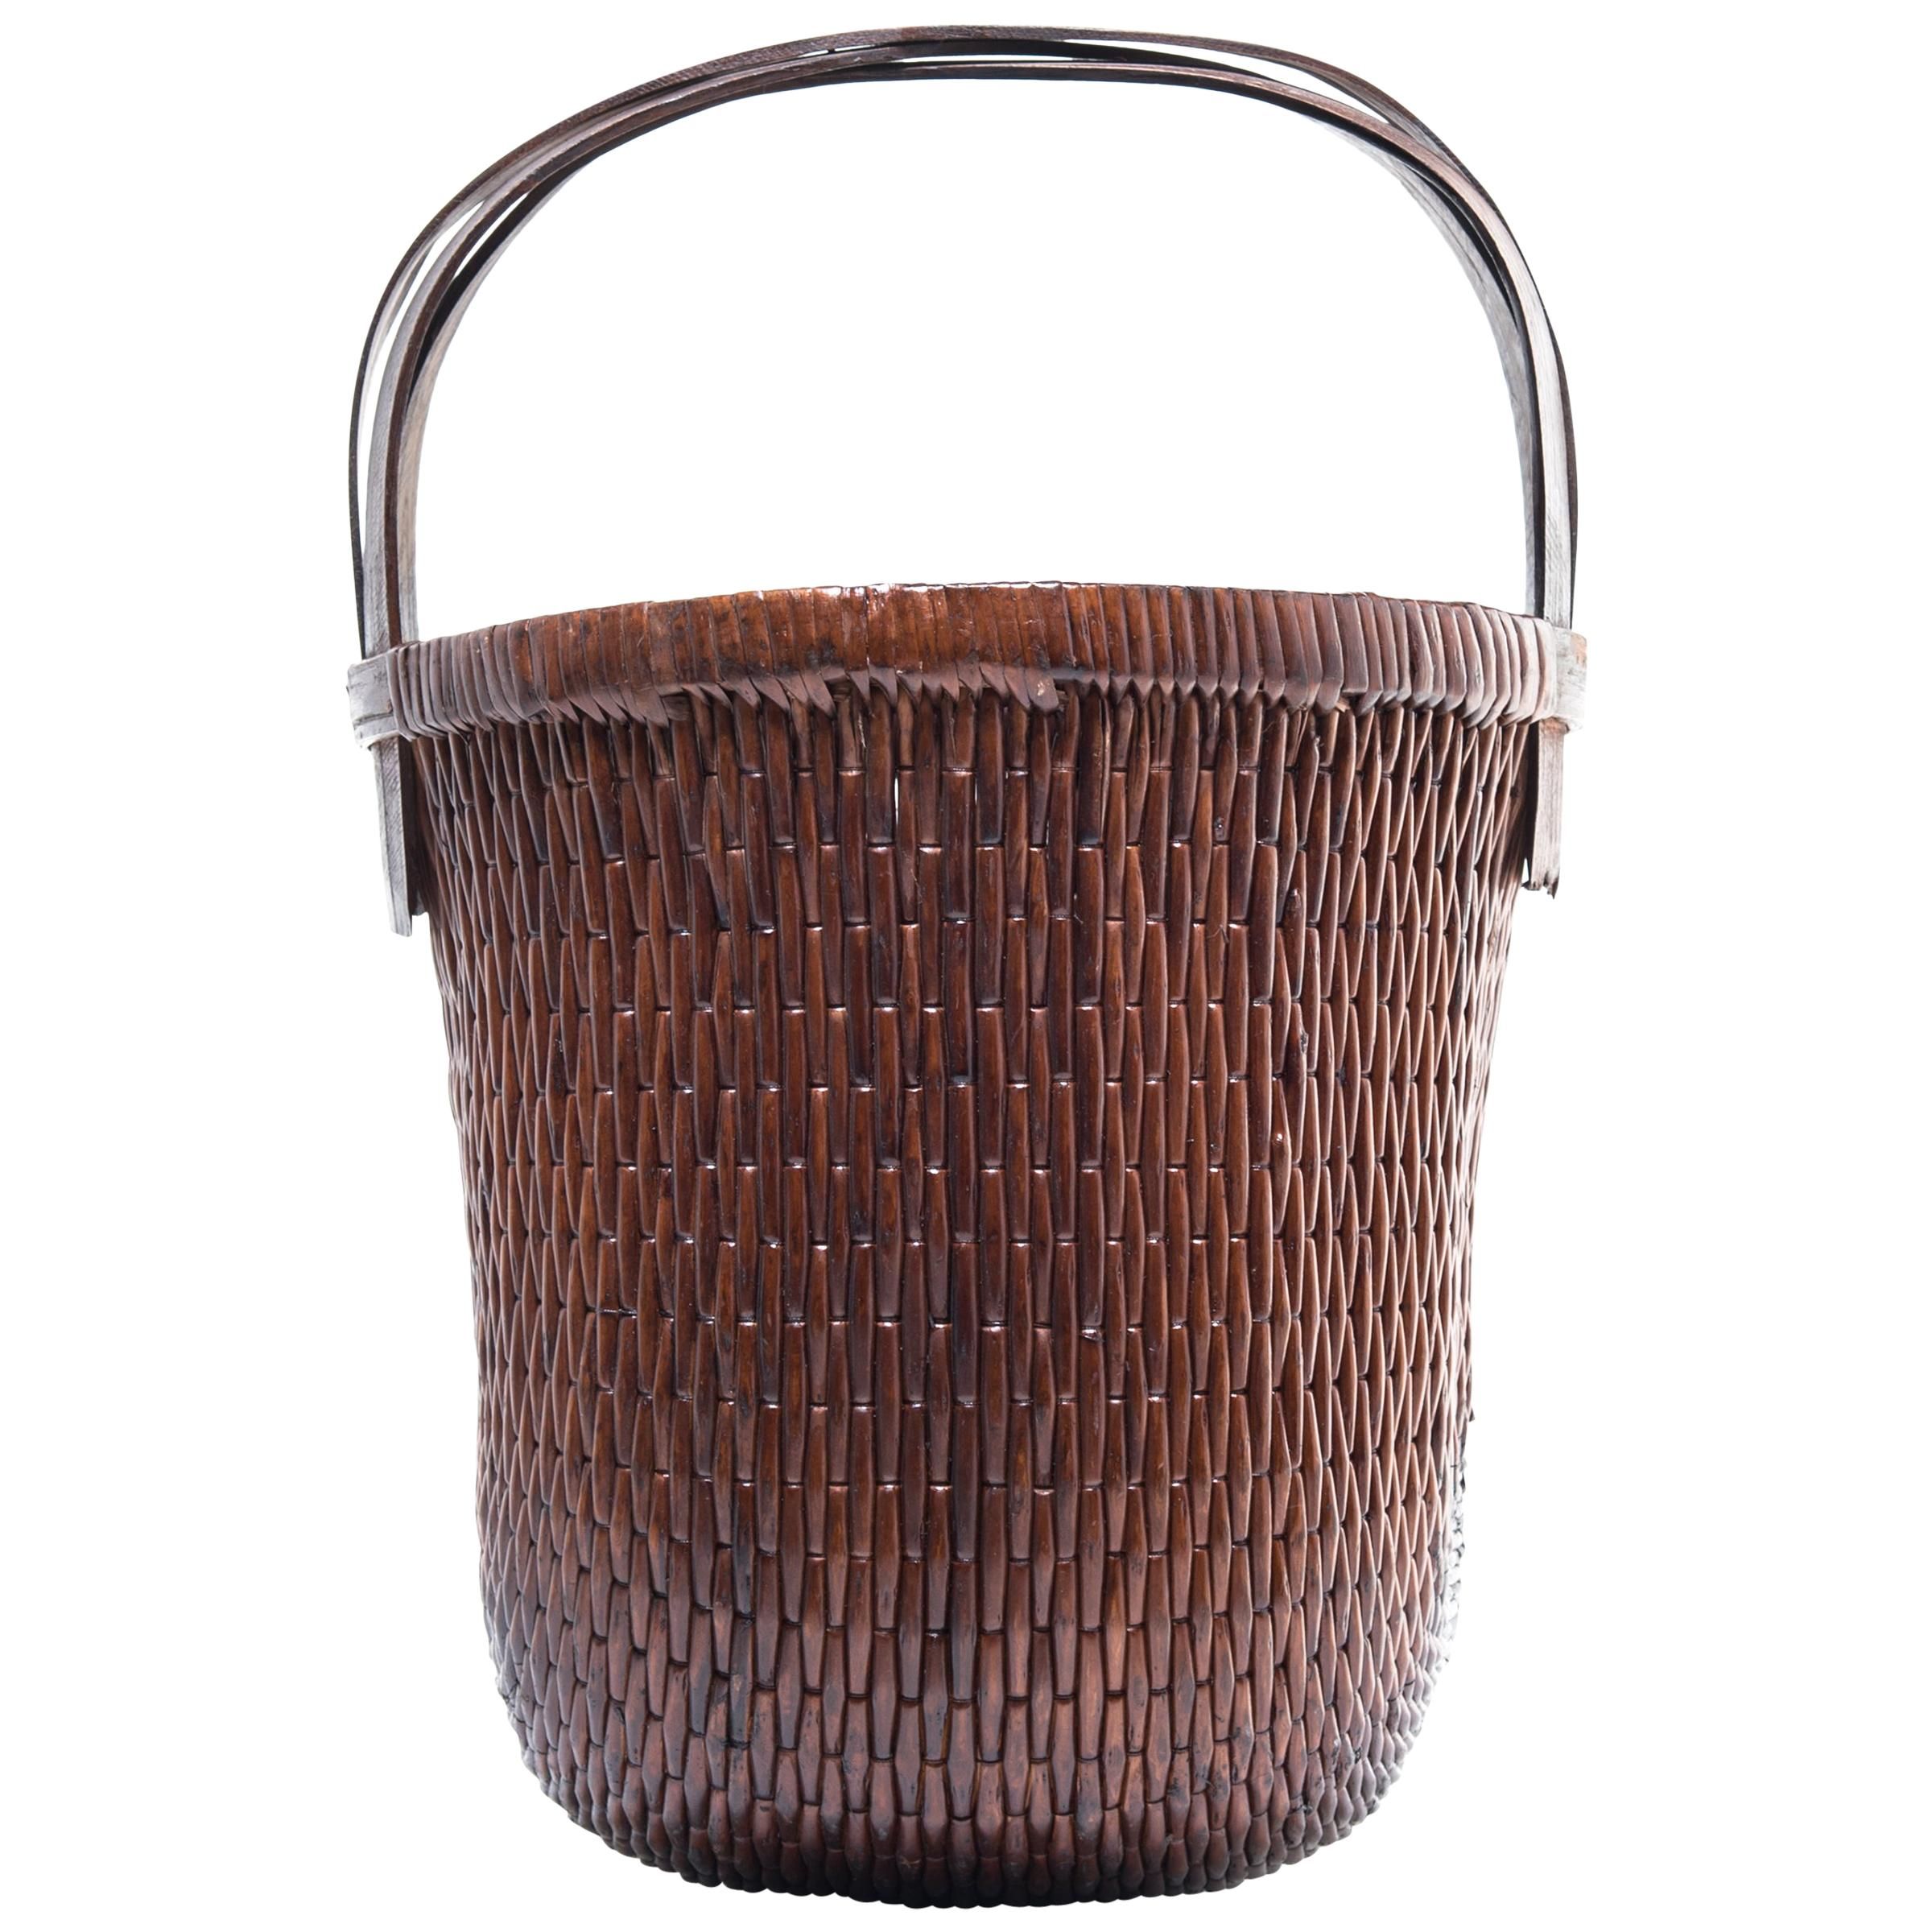 Chinese Bent Handle Willow Basket, circa 1900